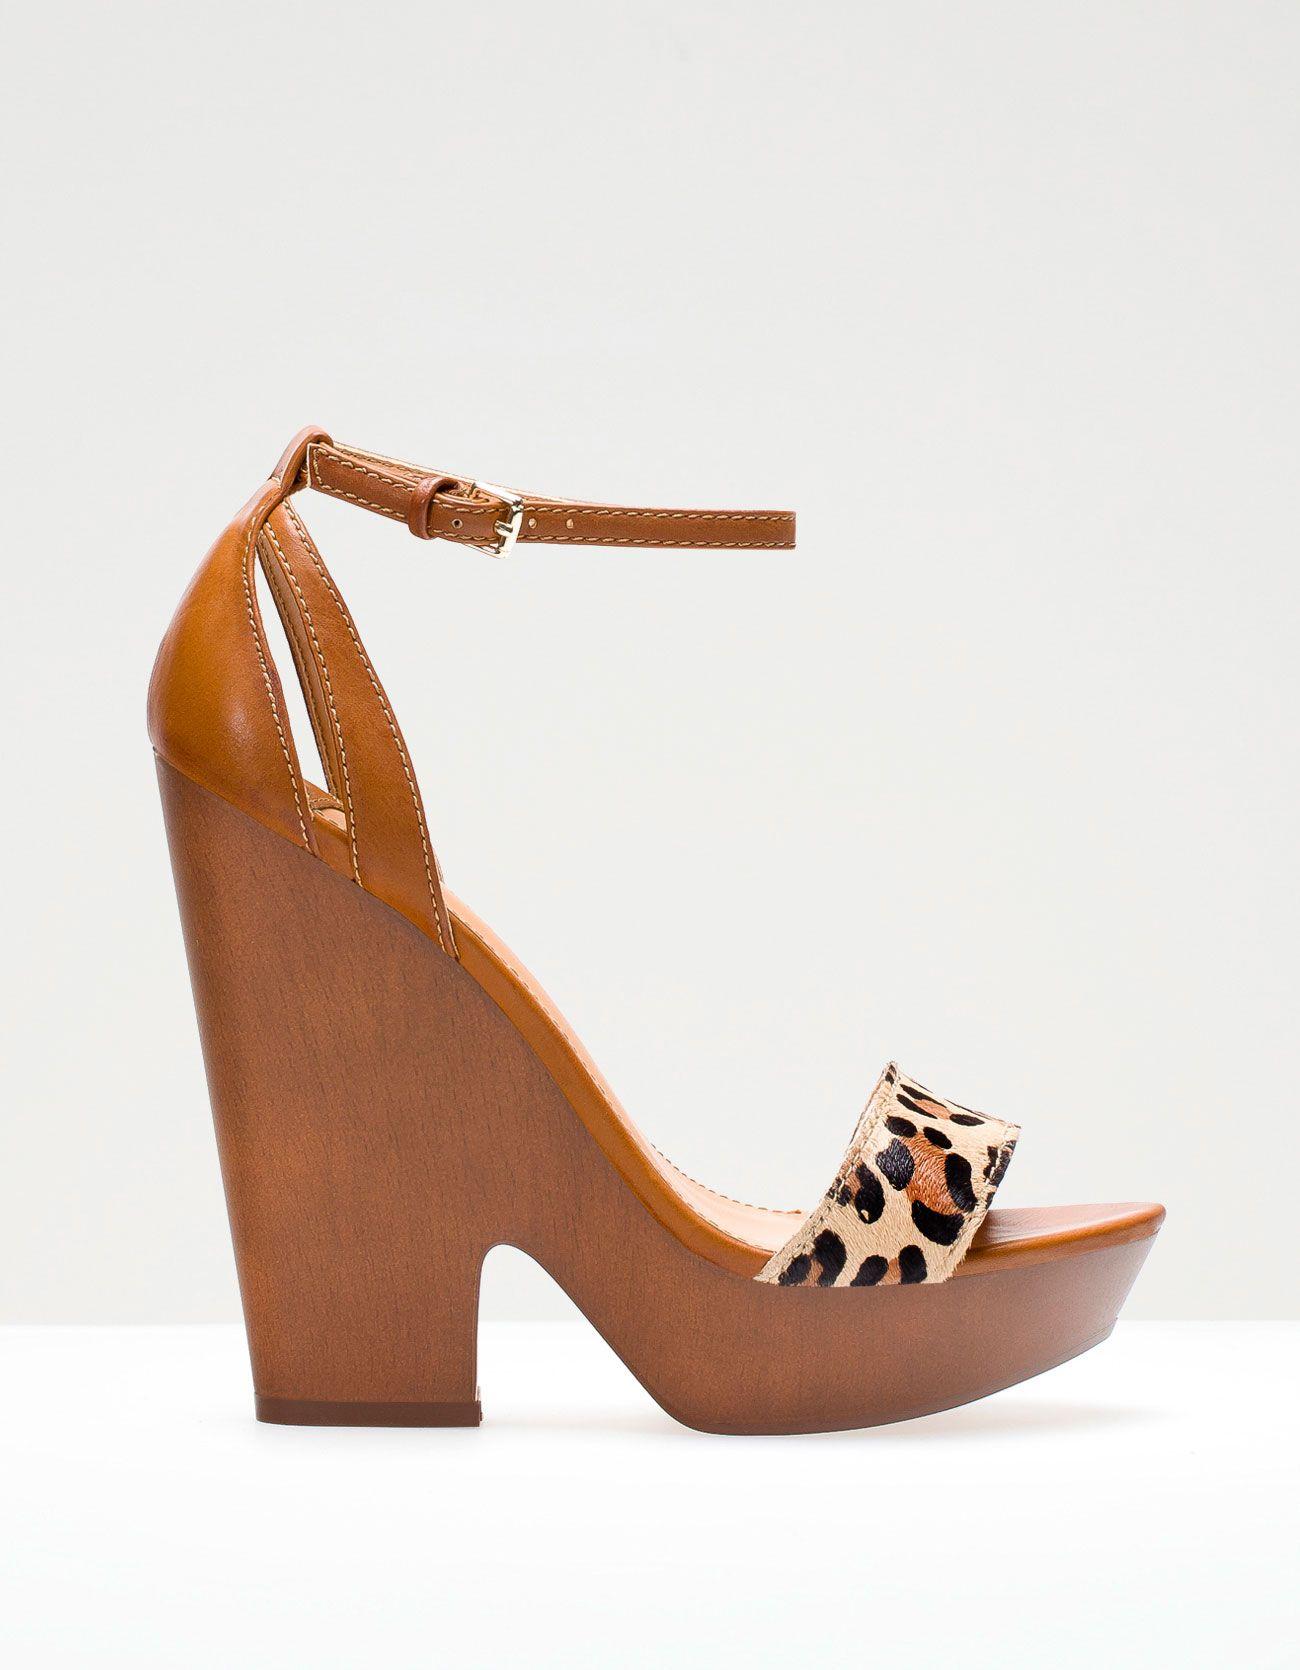 39 95 StradivariusSs13 Leopard Wooden Print Chaussures Wedges rdCoWxeB